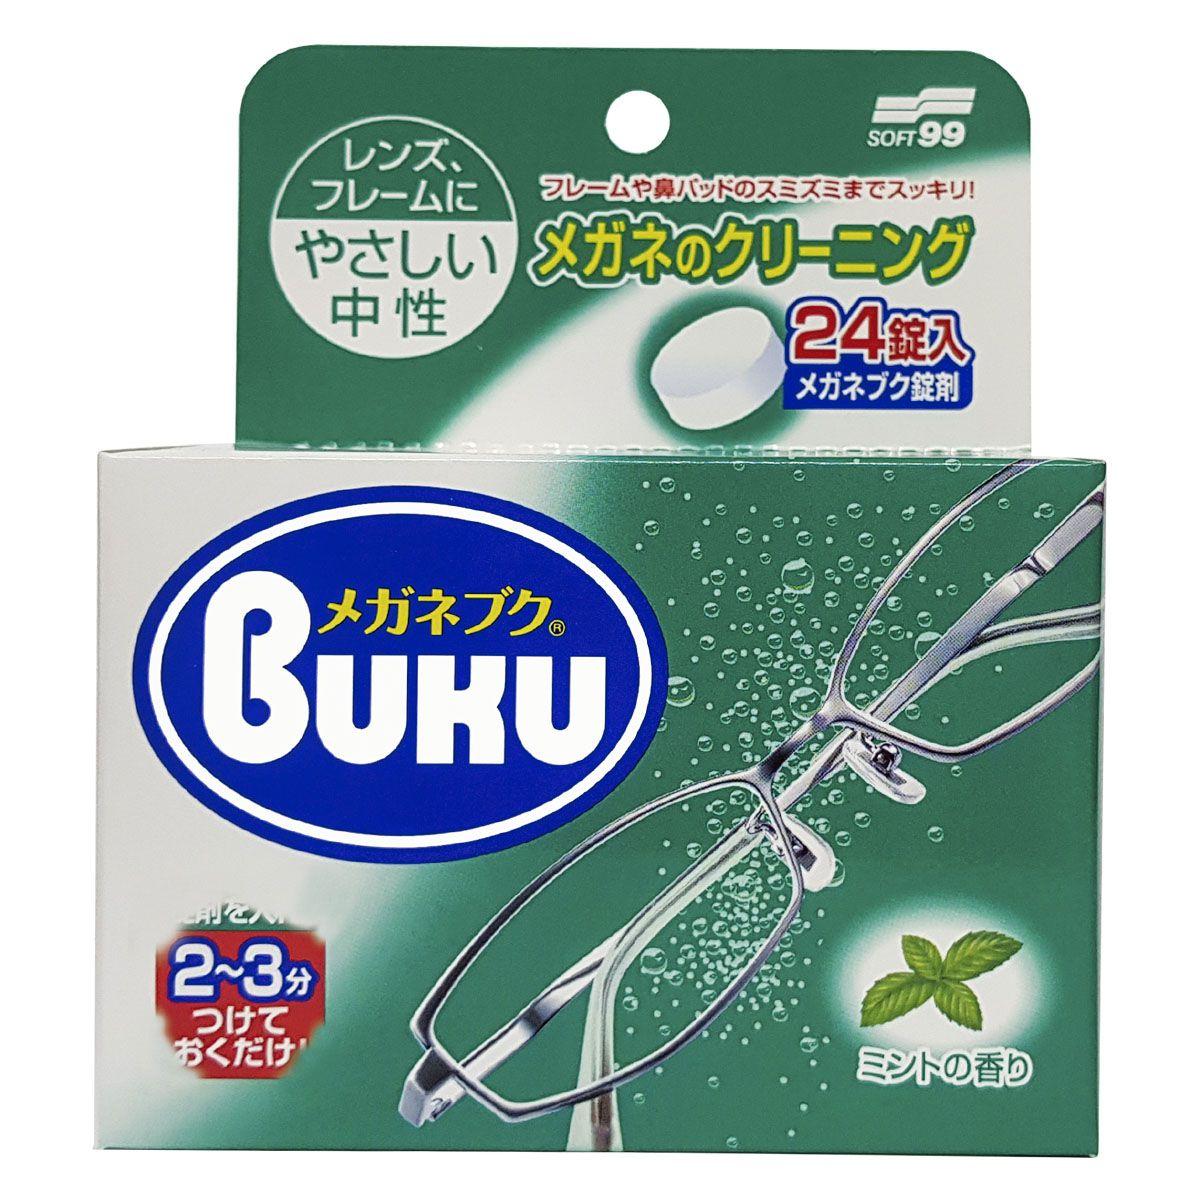 Pastilhas de Limpeza Higienizadora de Óculos 24 Unidades Soft99